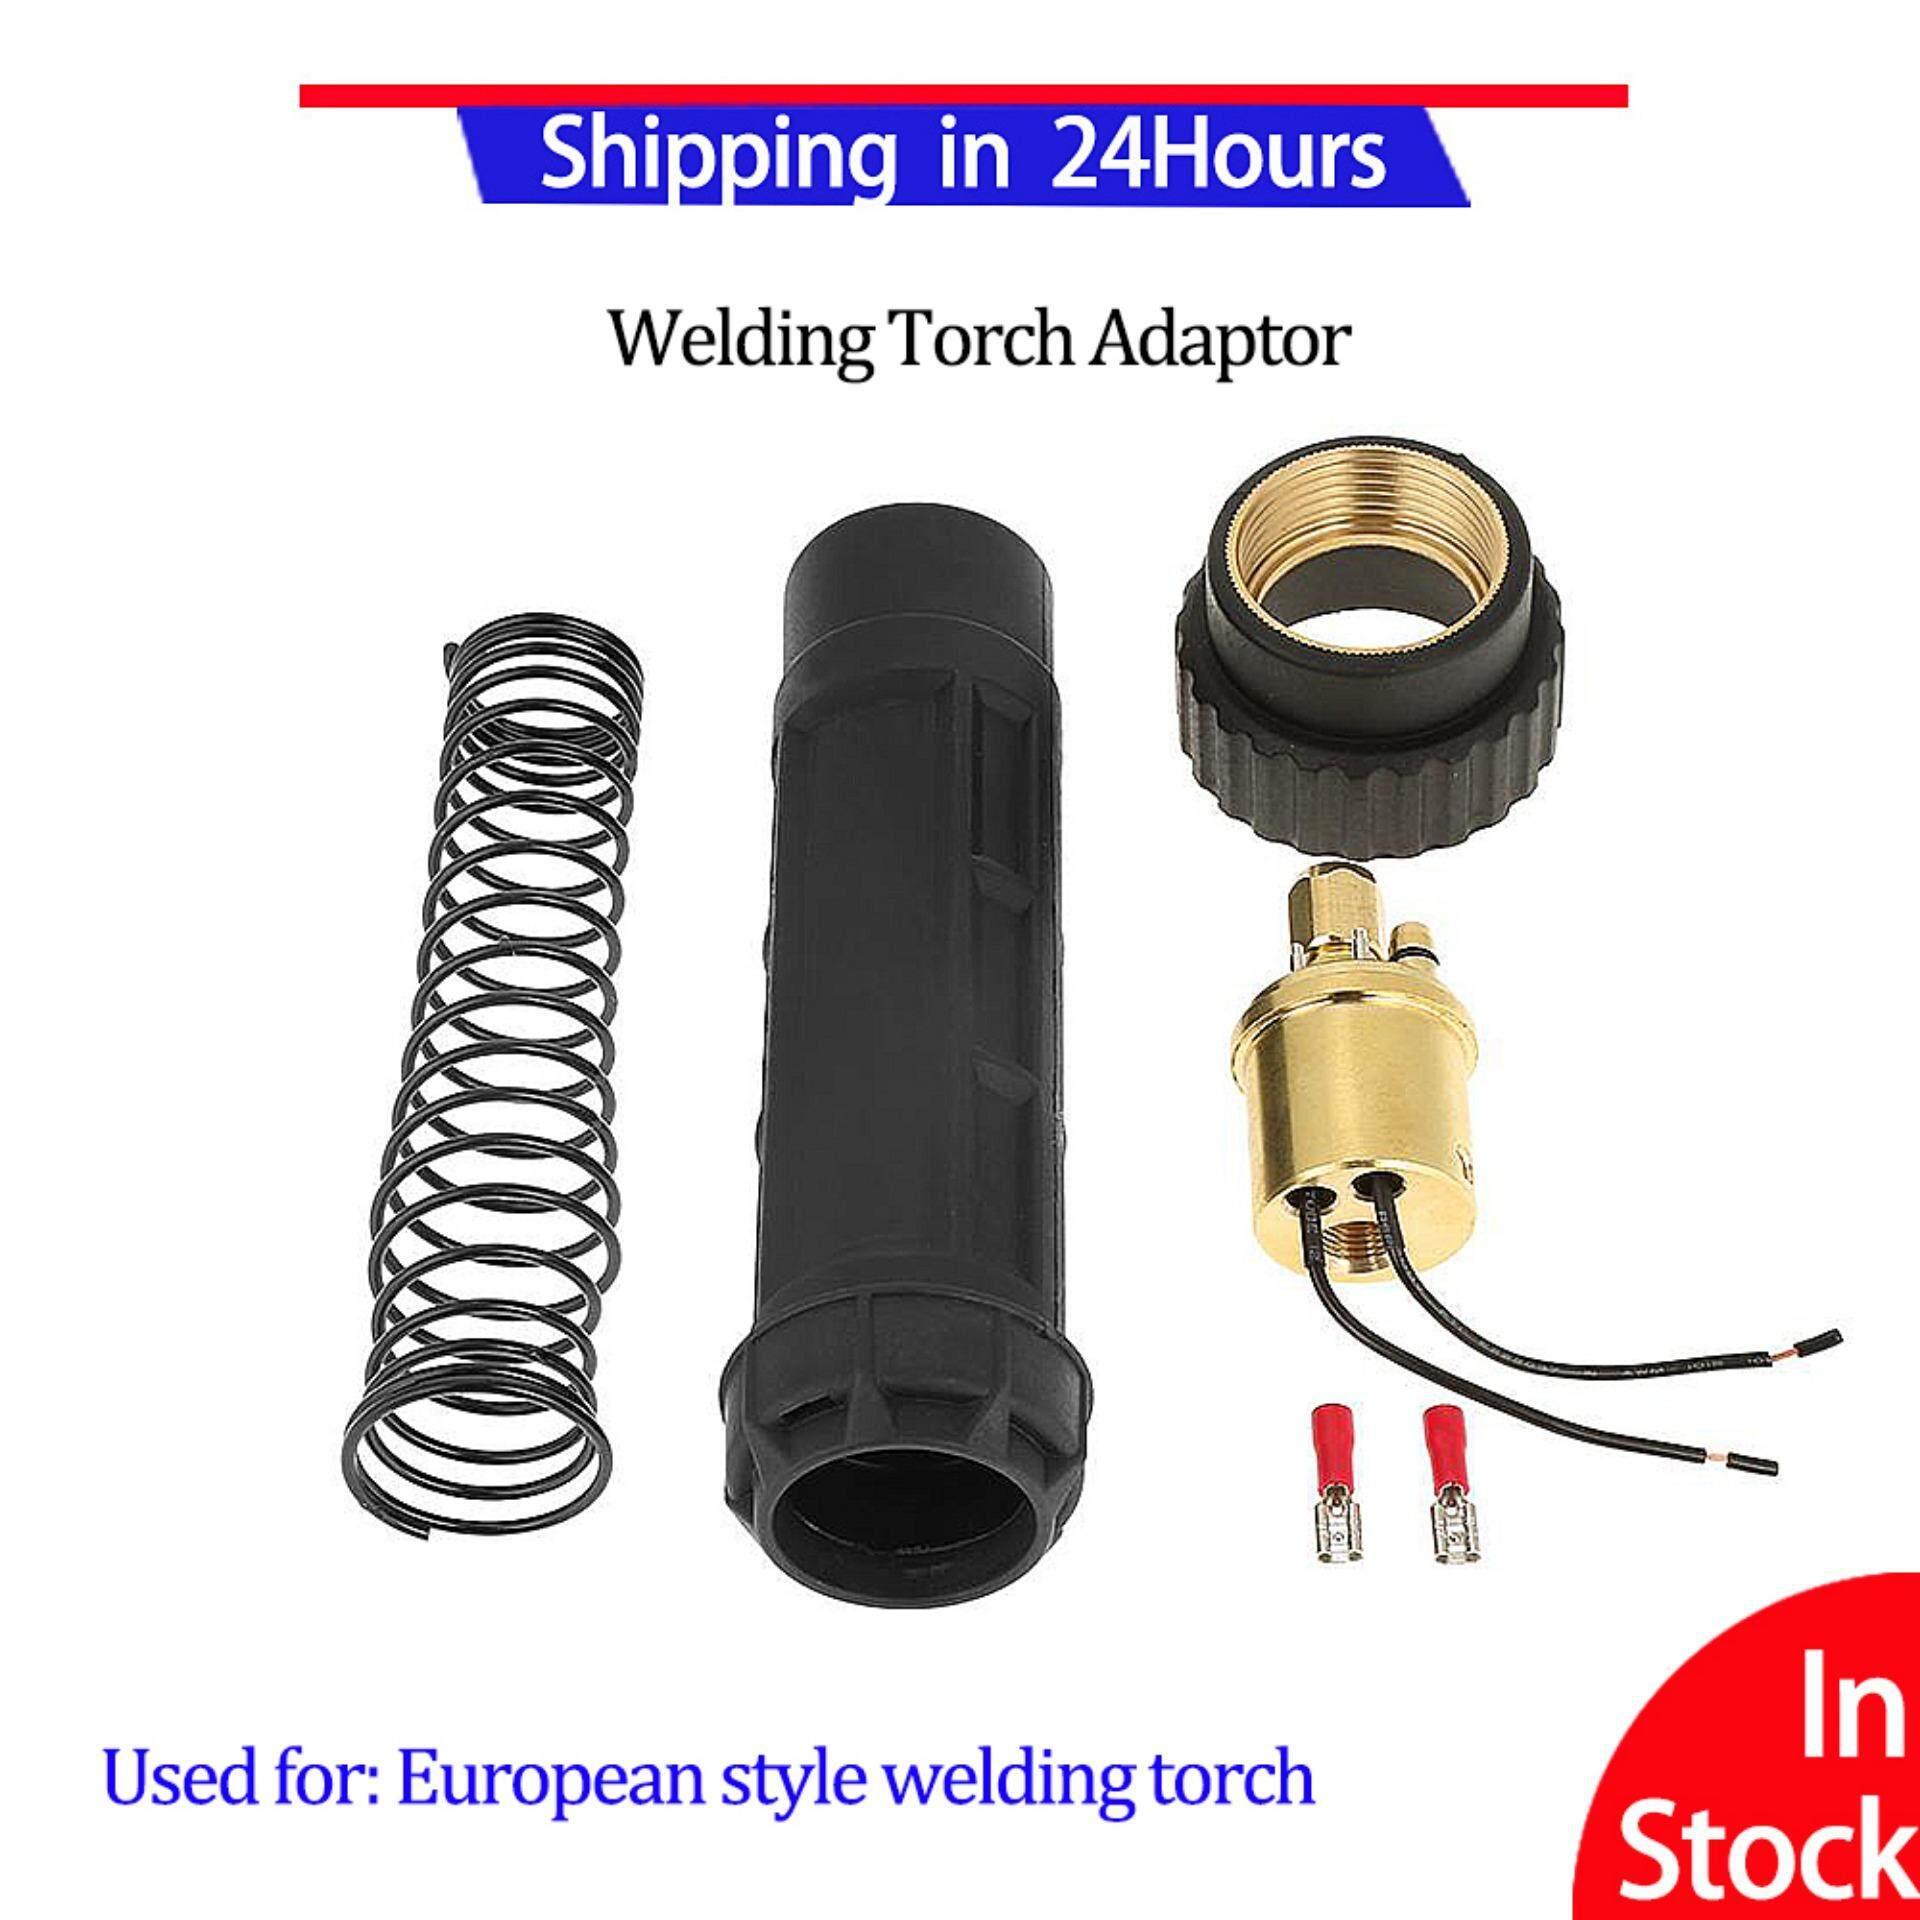 Welding Torch Adaptor Euro Fitting Connector Brass CO2 Mig Welding Torch Adaptor Conversion Kit Set